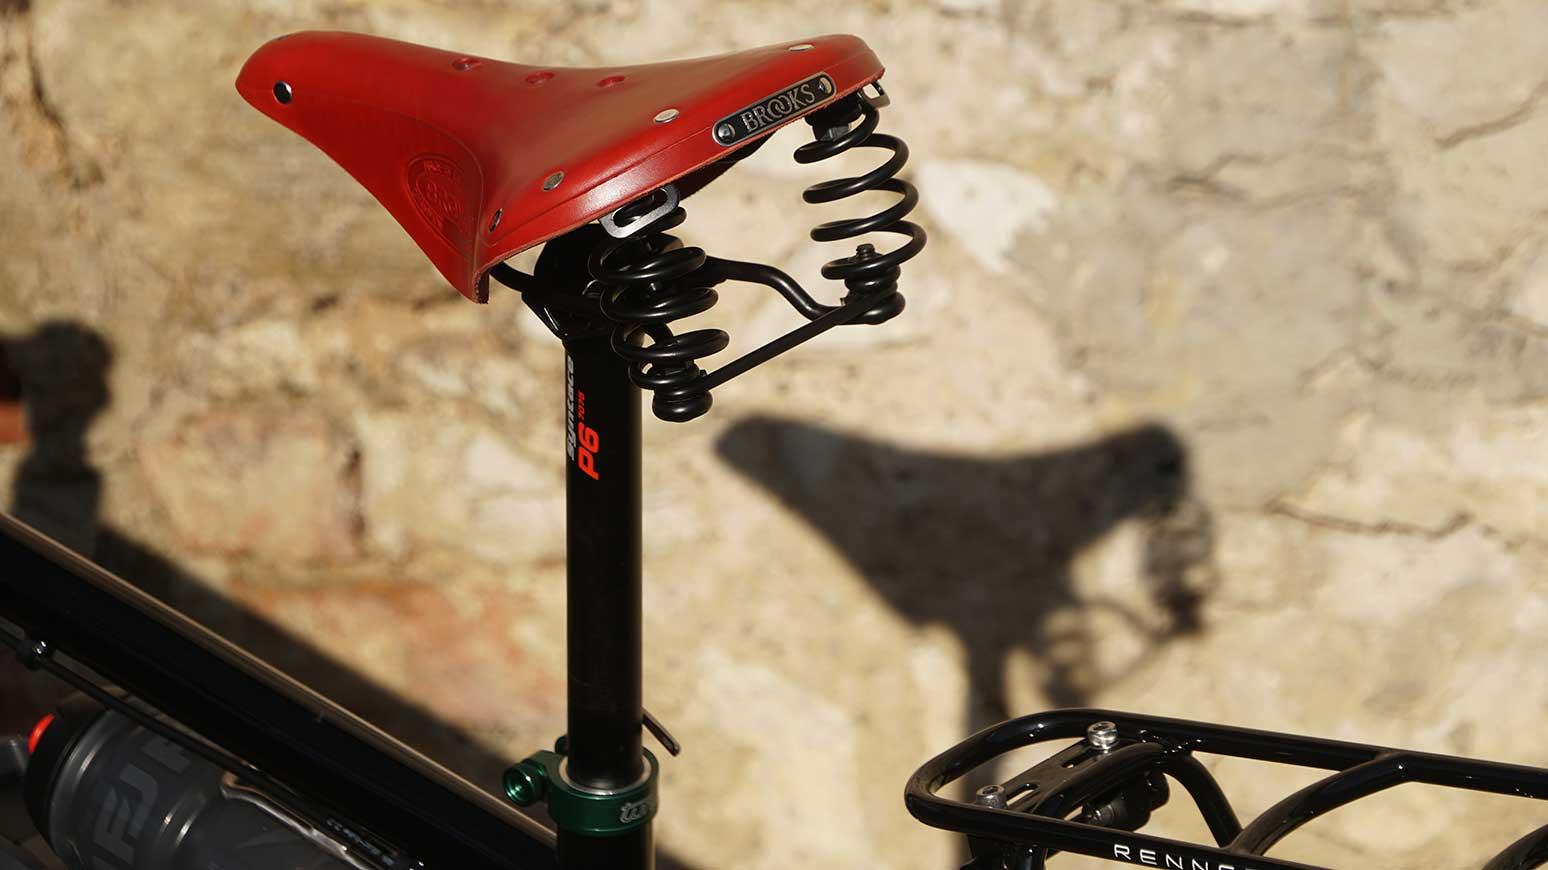 Rennrad Reiserad Rohloff: Brooks Sattel in Rot